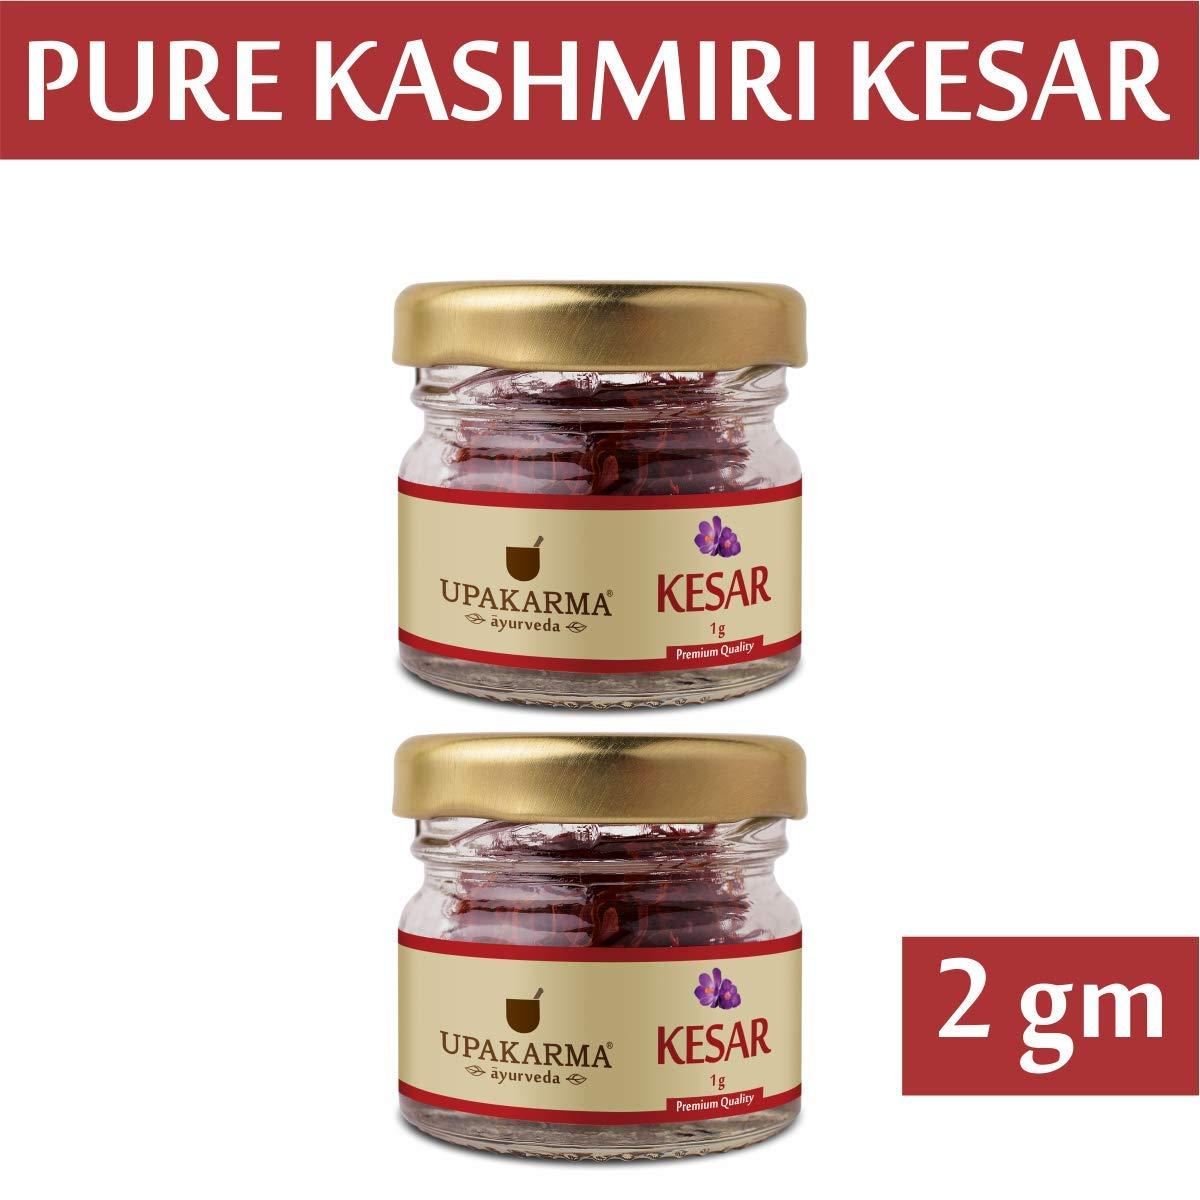 Purest & Finest Kashmiri Saffron/Kesar - 1 gm (Certified Grade - I, Premium A++, Inspired from Spanish Saffron) (1) (2 Gram 0.07 oz)